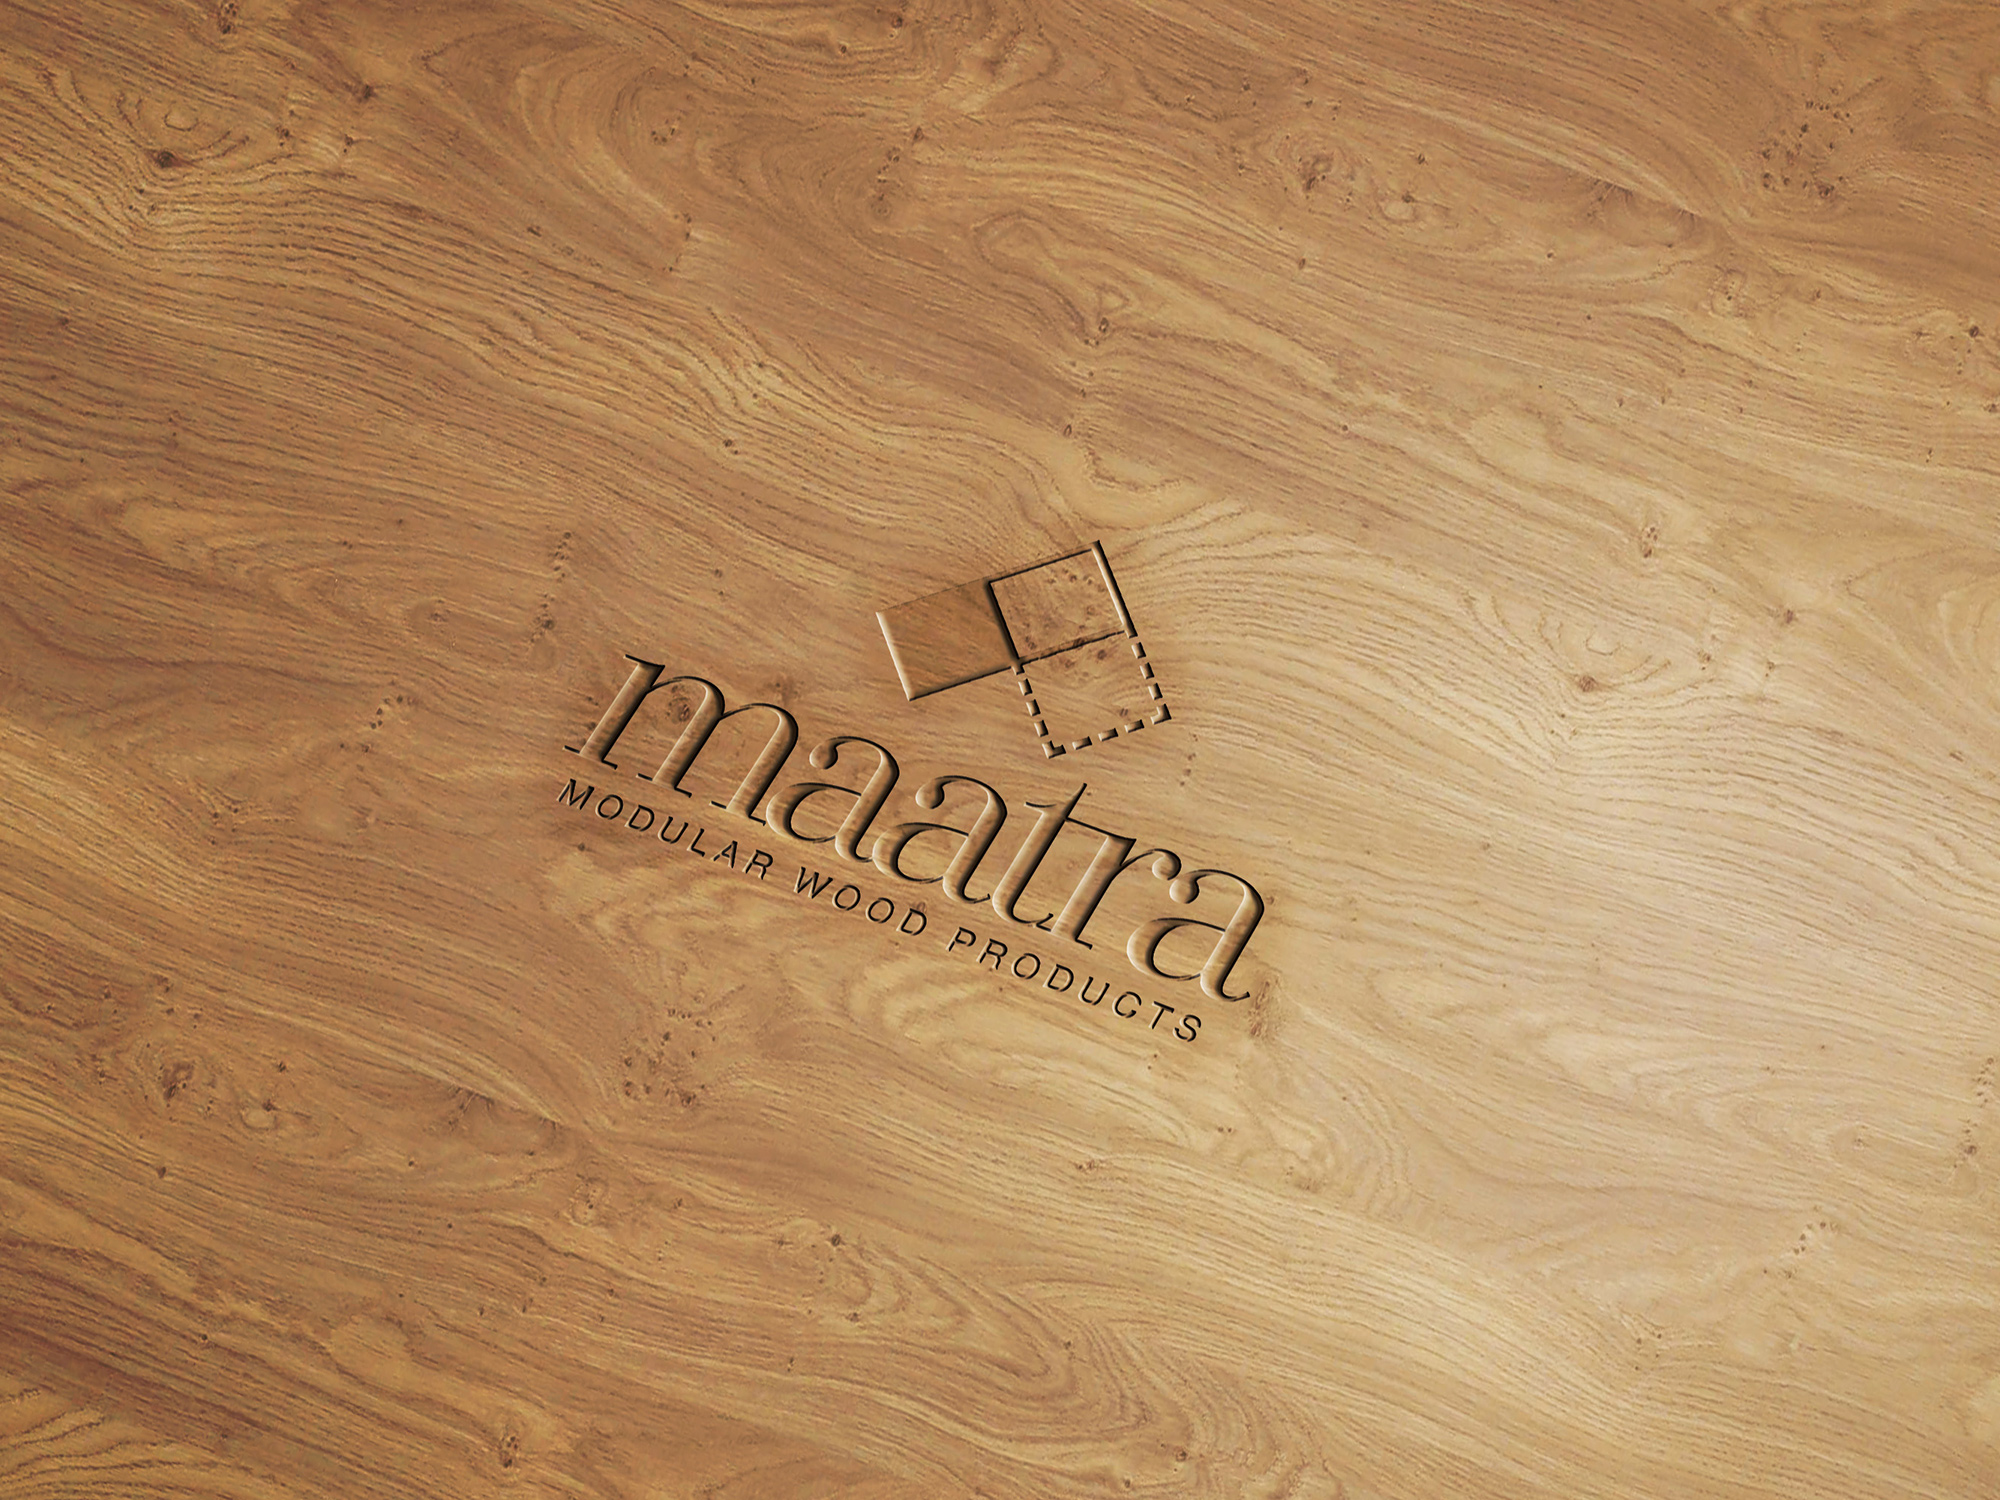 Maatra_03WoodEngravedLogo